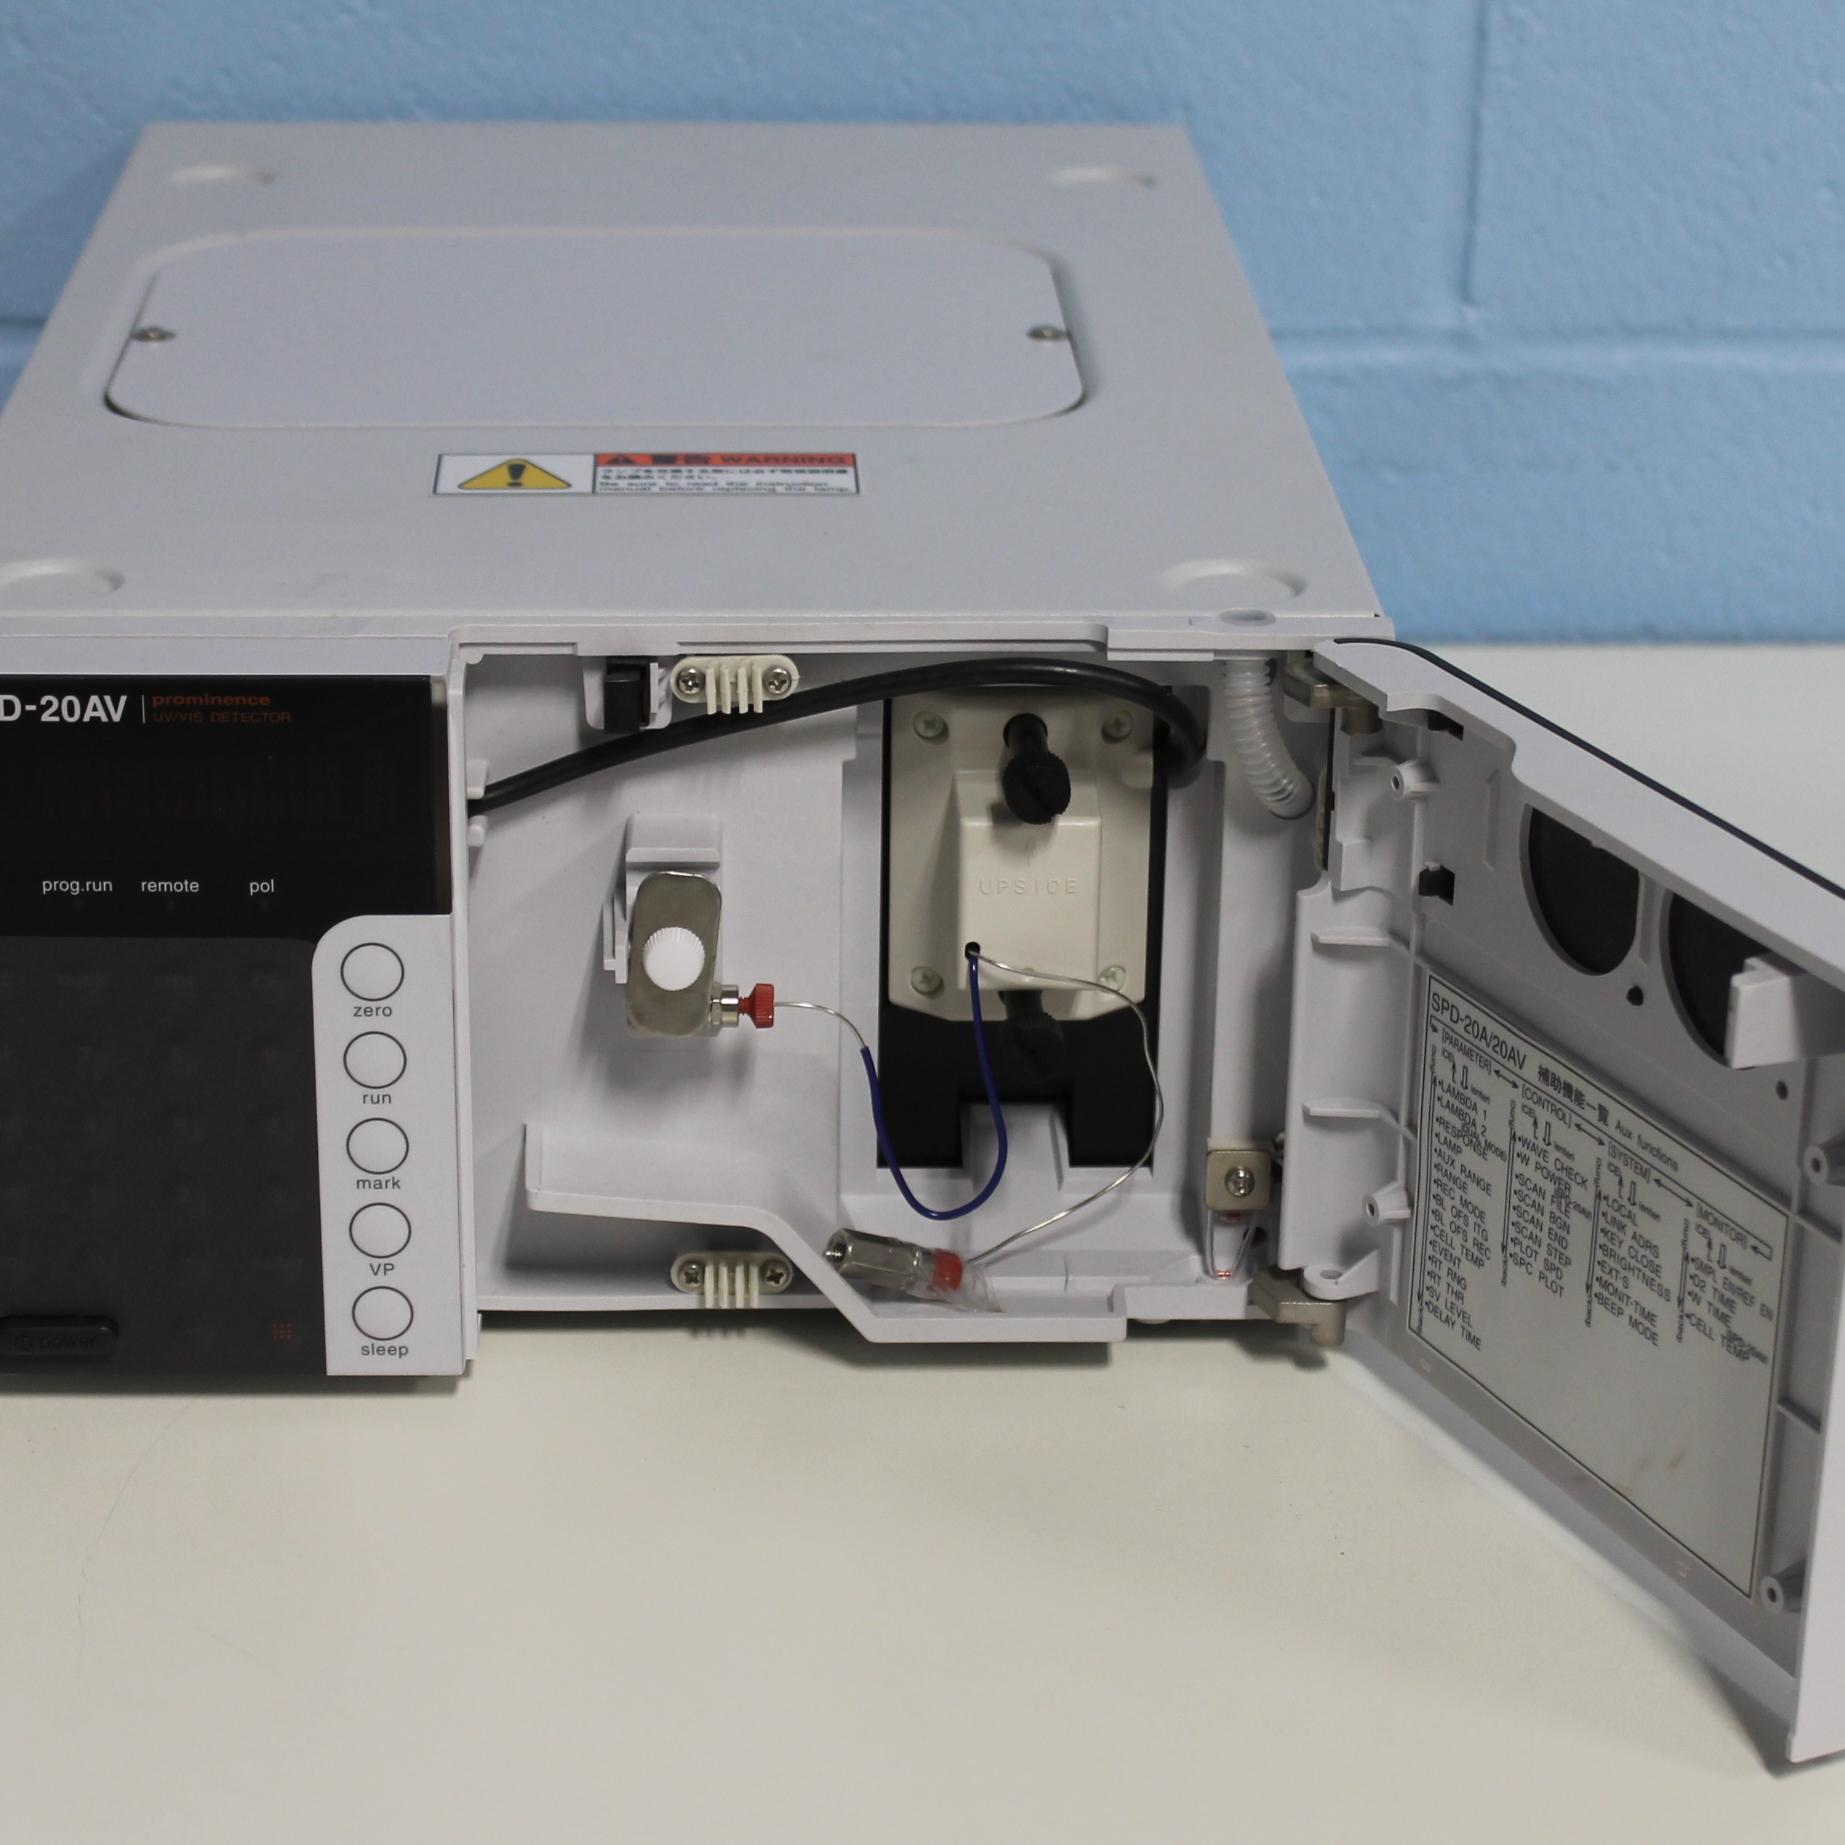 Shimadzu Prominence SPD-20AV UV/Vis Detector Image